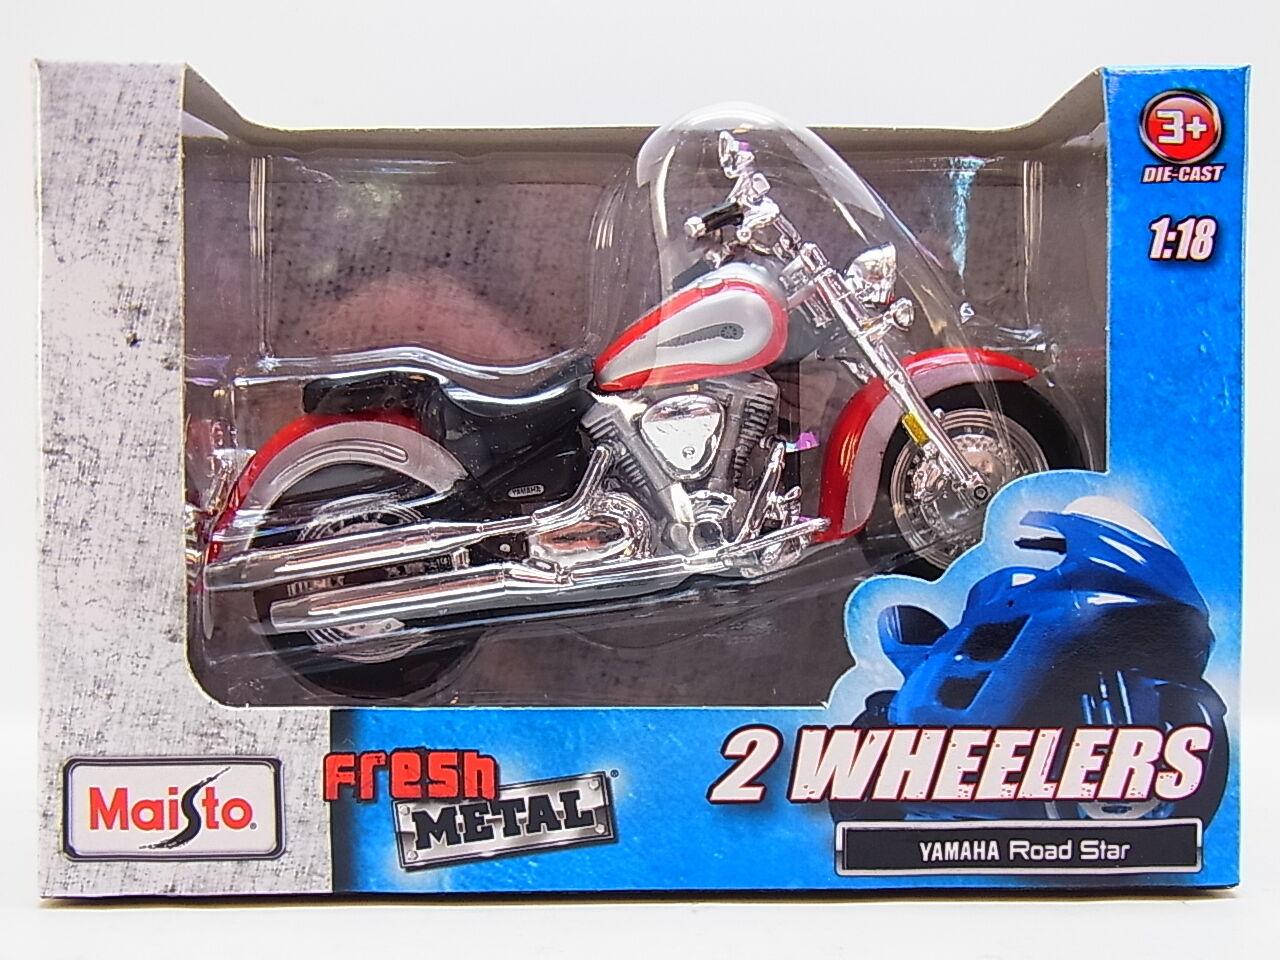 LOT 13272   Maisto 2 Wheelers  Yamaha Road Star  Die-Cast Motorrad 1 18 NEU OVP